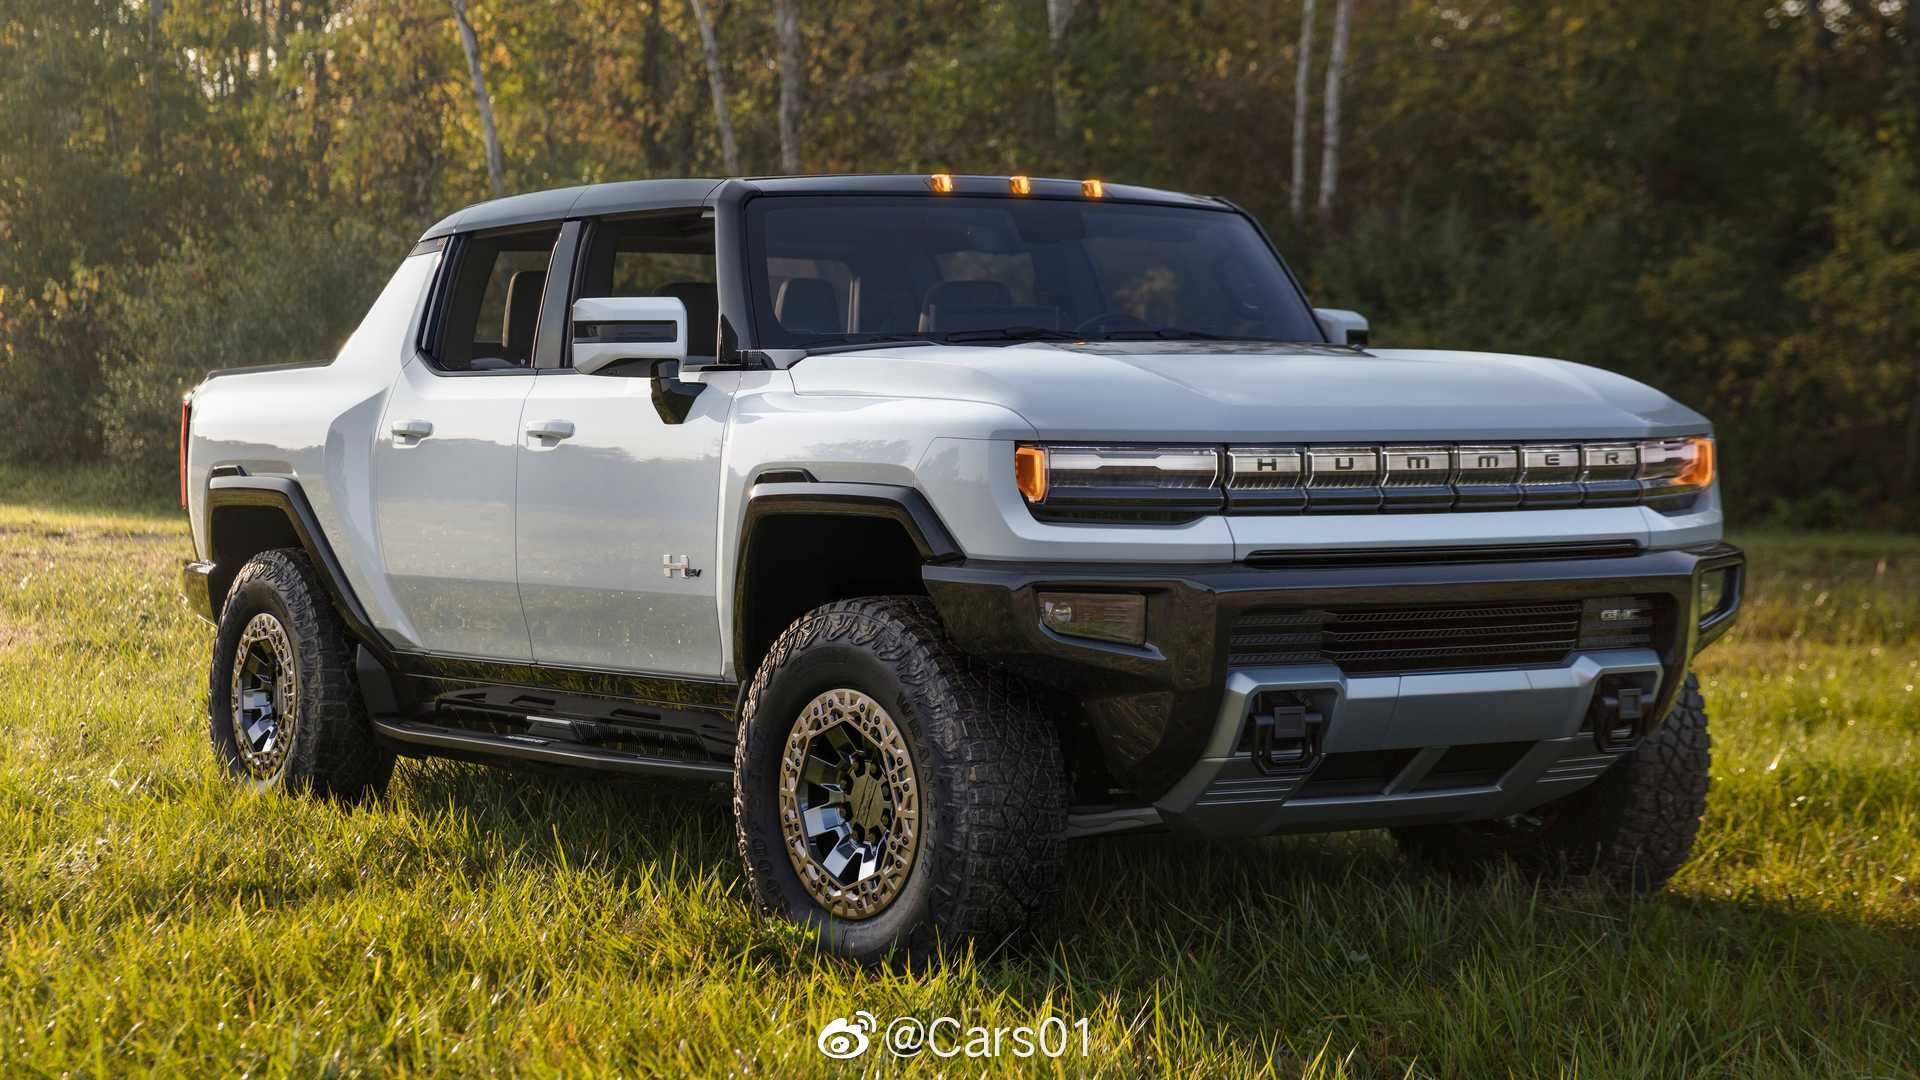 GMC悍马EV官图发布,新车的外观和内饰采用全新硬派设计风格